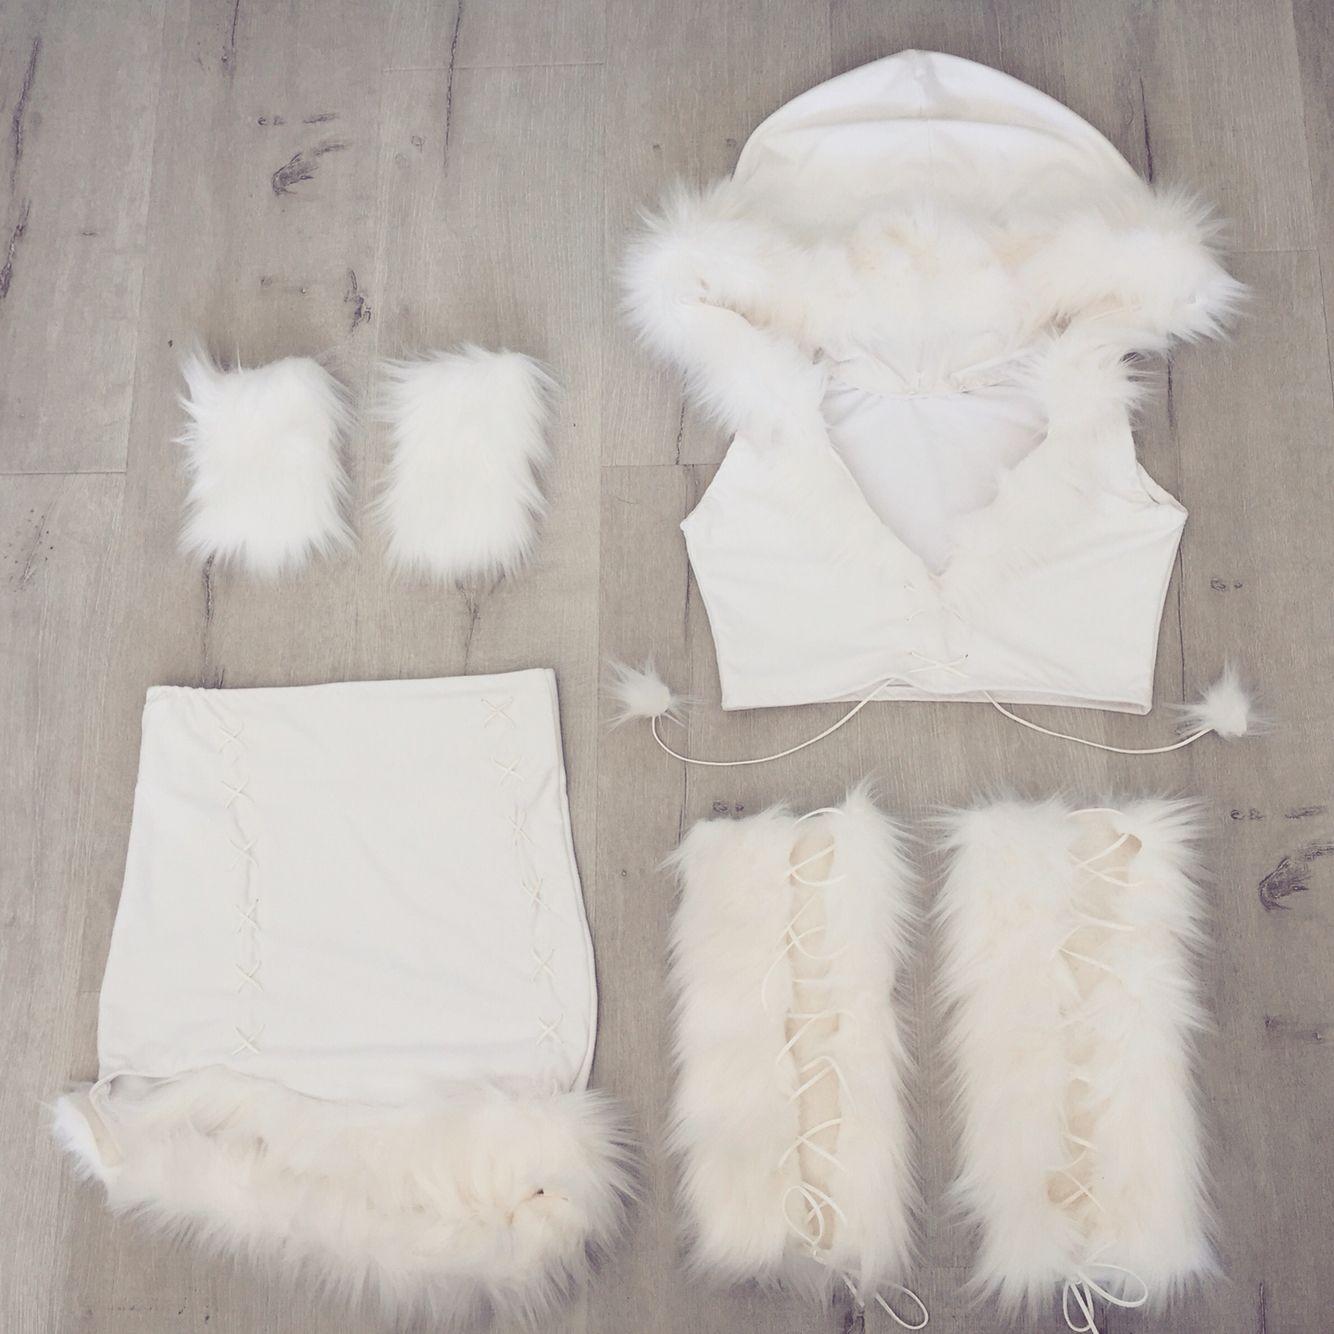 Gmail themes halloween - Eskimo Costume Snow White Princess Kylie Jenner Halloween Costume Handmade Email Nanibikini Gmail Com